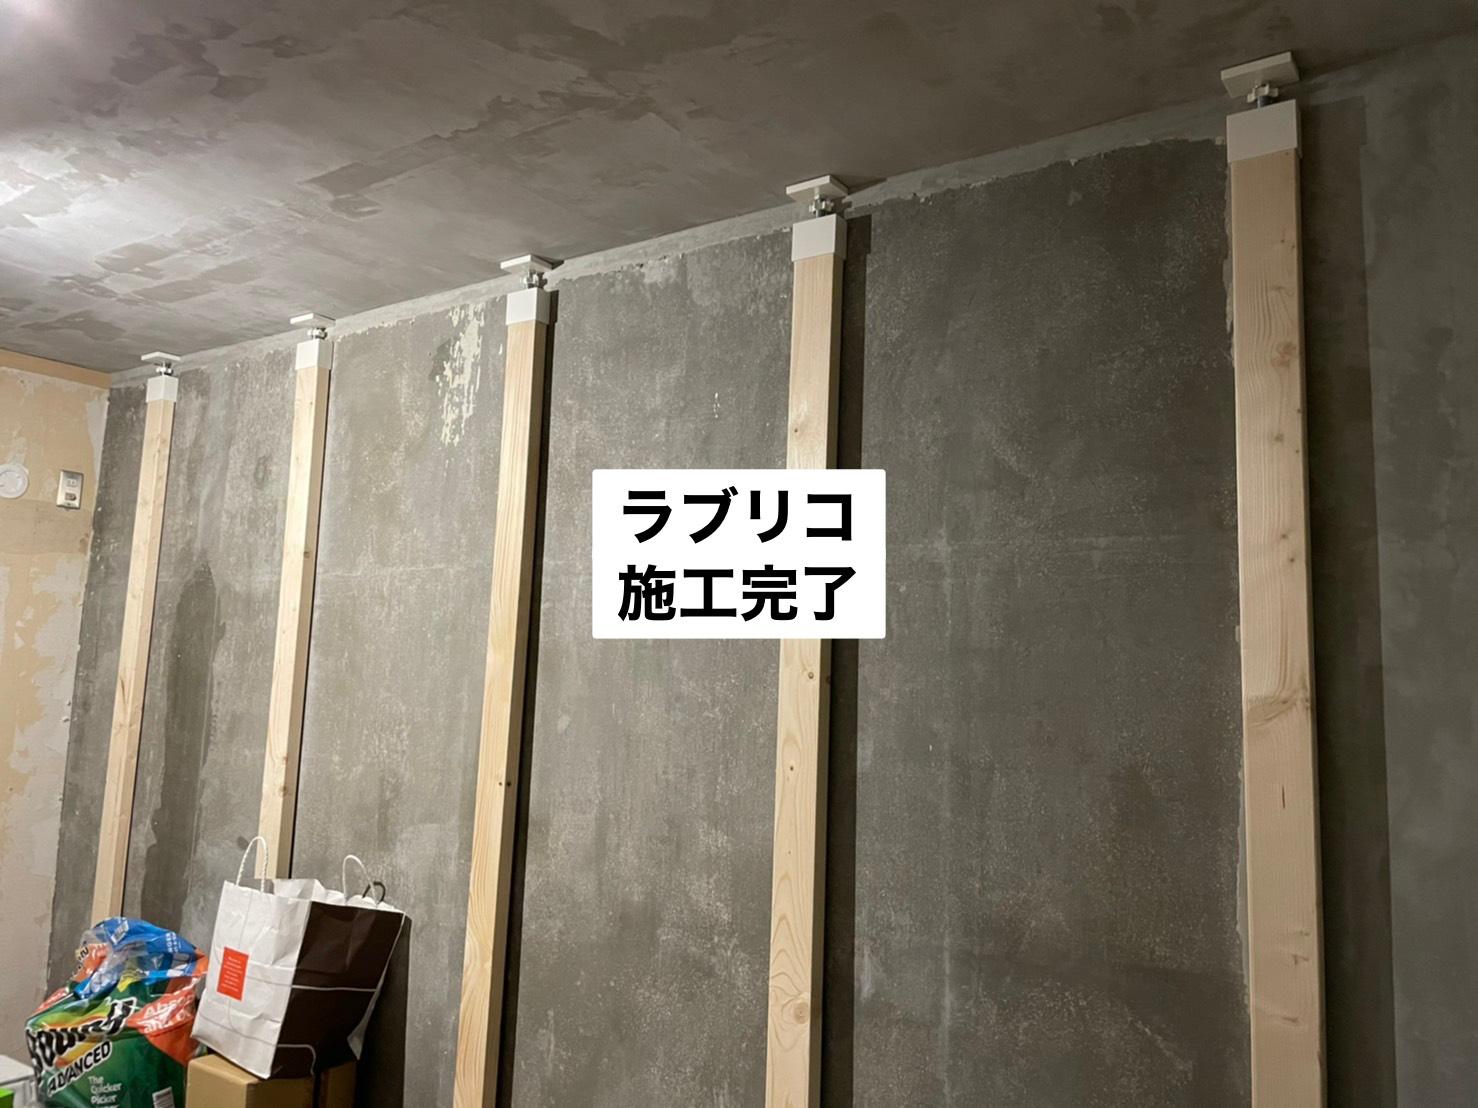 https://ouchikaeritai.com/2021/06/01/jitsurei-shuunou-planninng1/